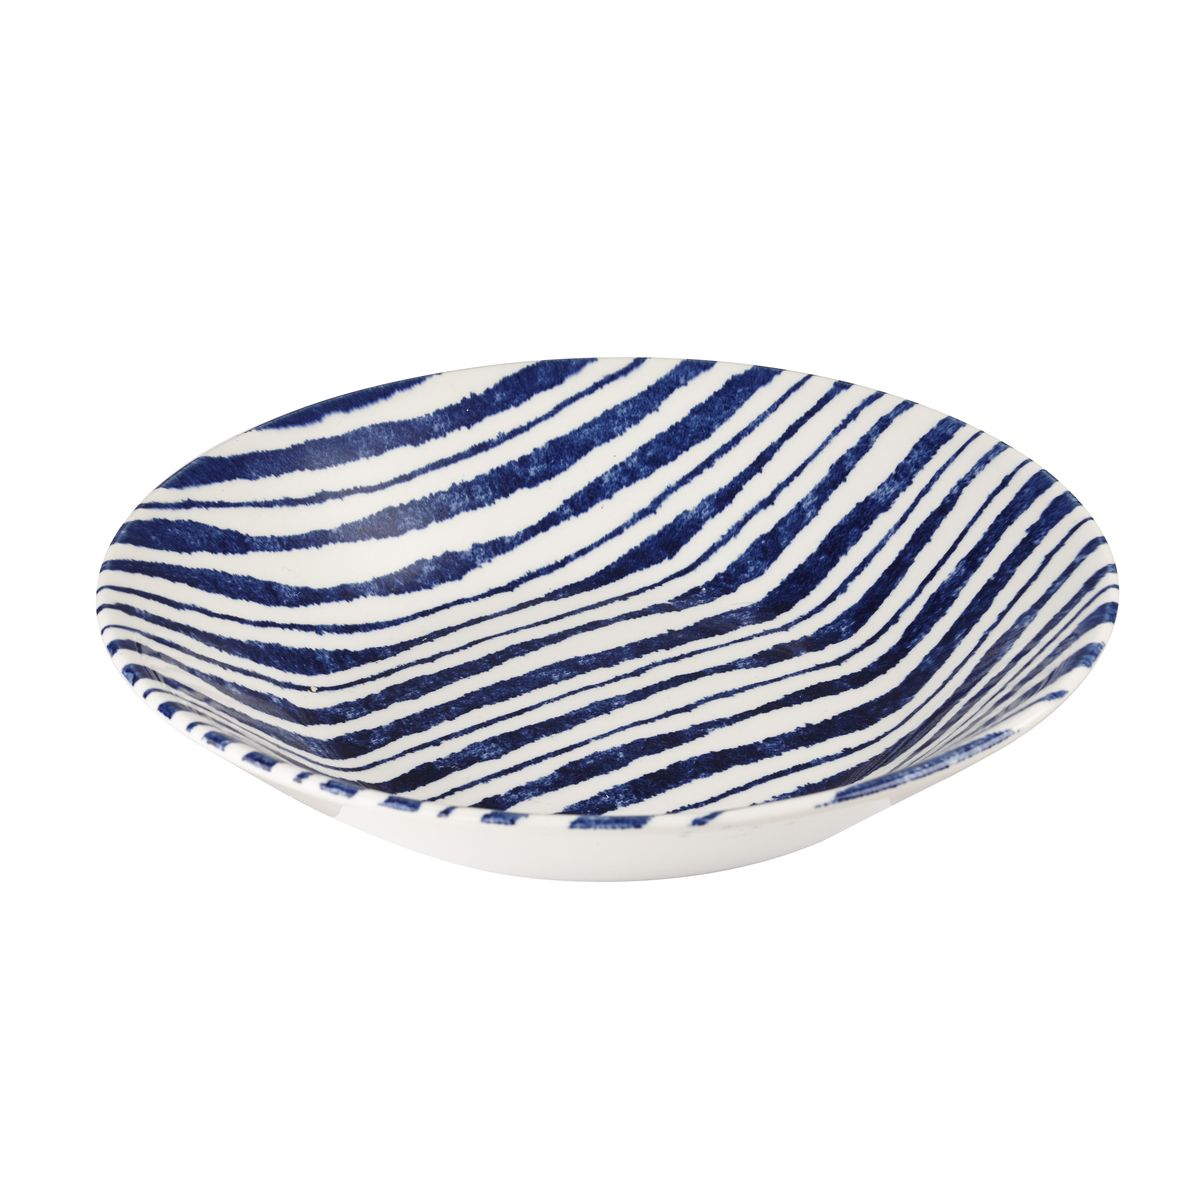 Тарелка суповая Churchill Инки, диаметр 20 см тарелка суповая фиц строуберри диаметр 20 см 897824